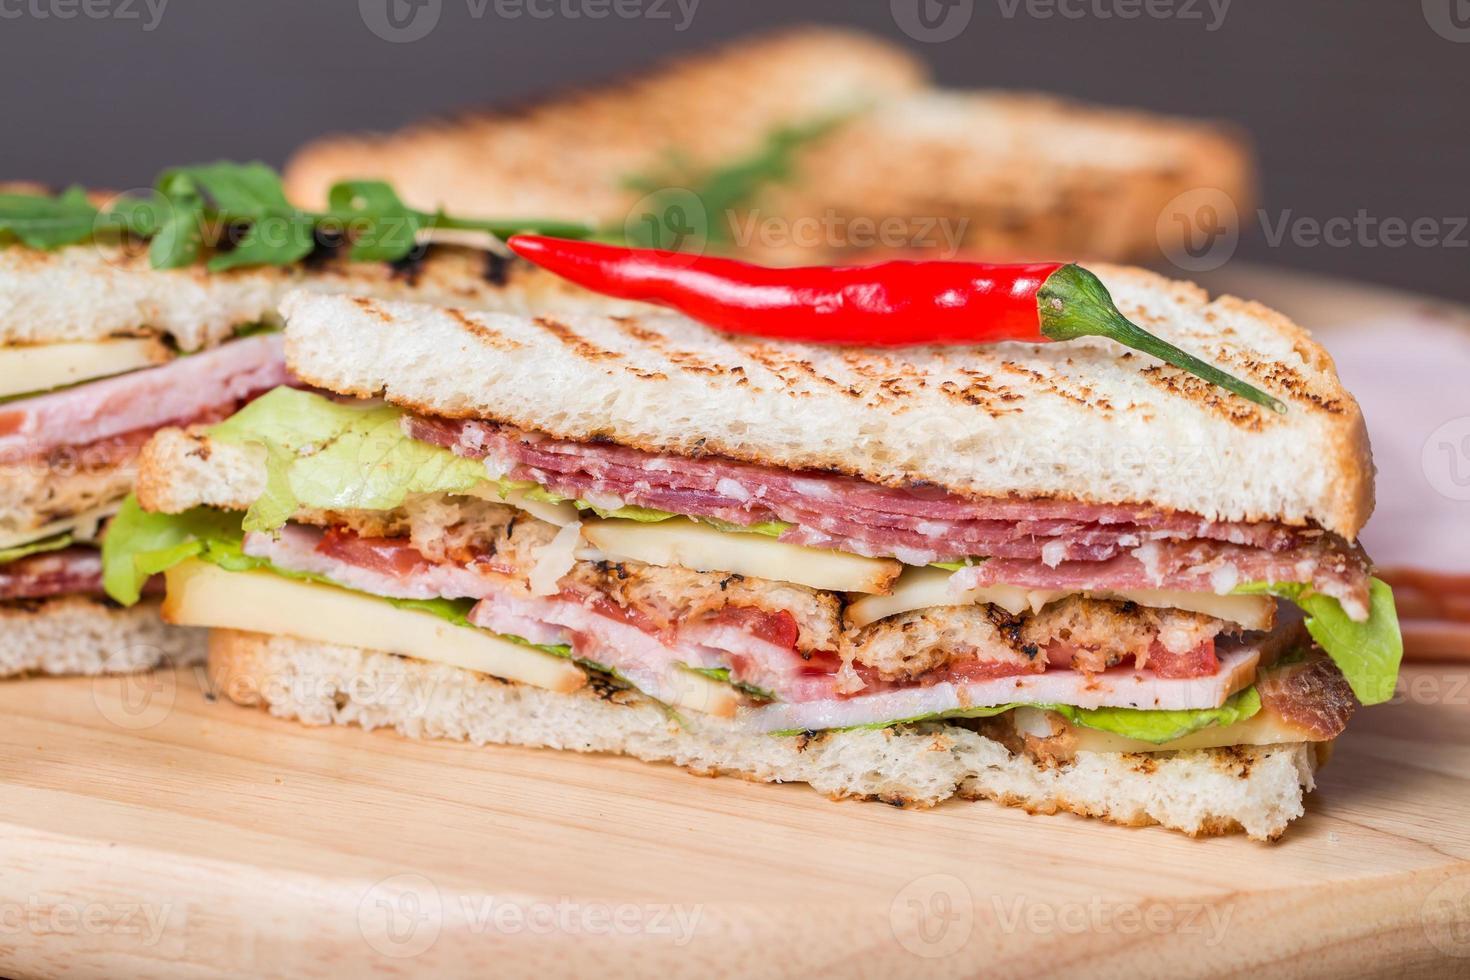 vers gemaakte clubsandwiches foto